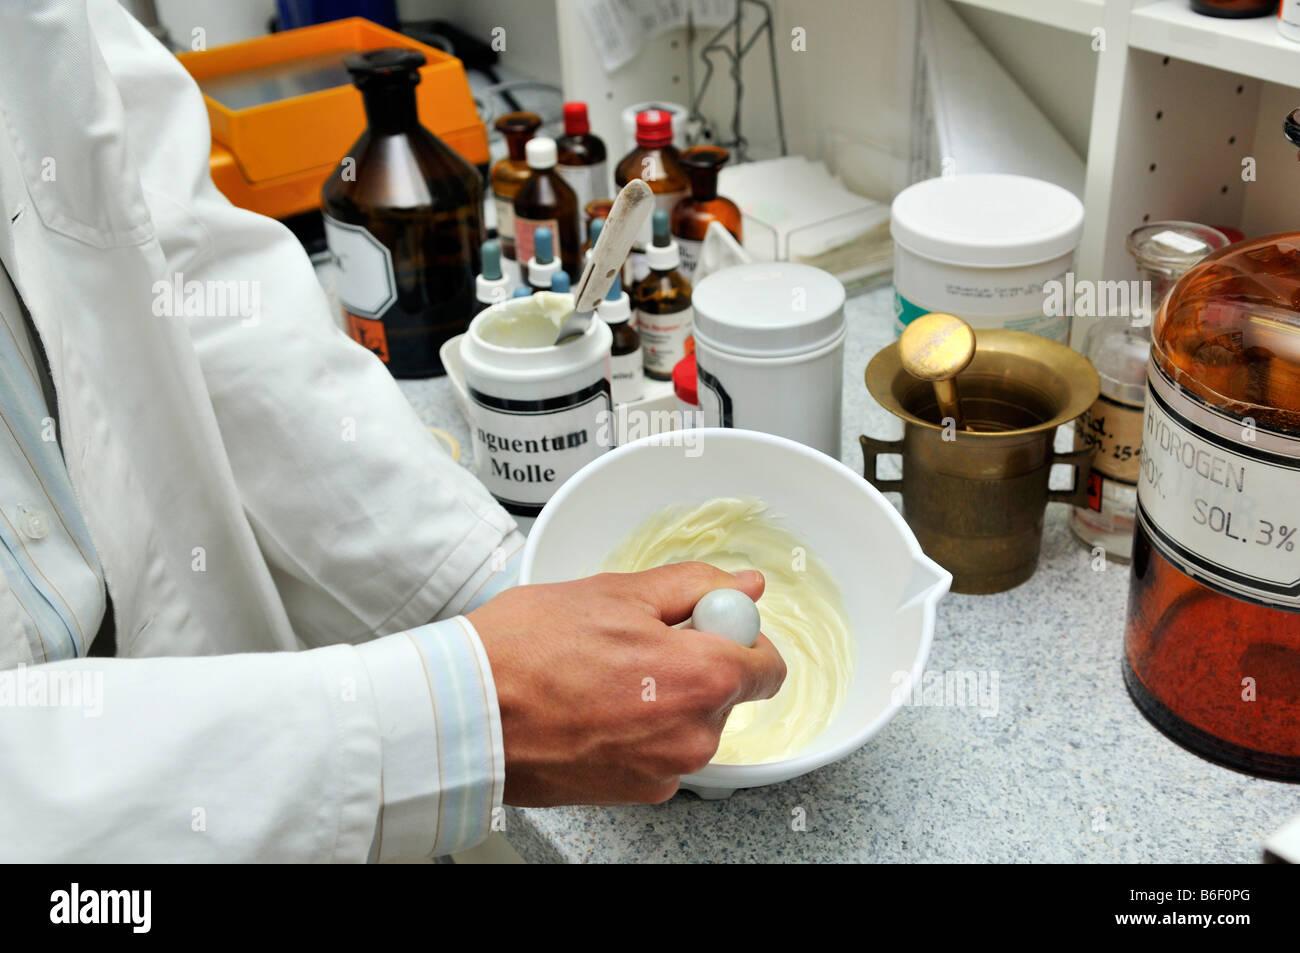 Chemist mixing a salve - Stock Image